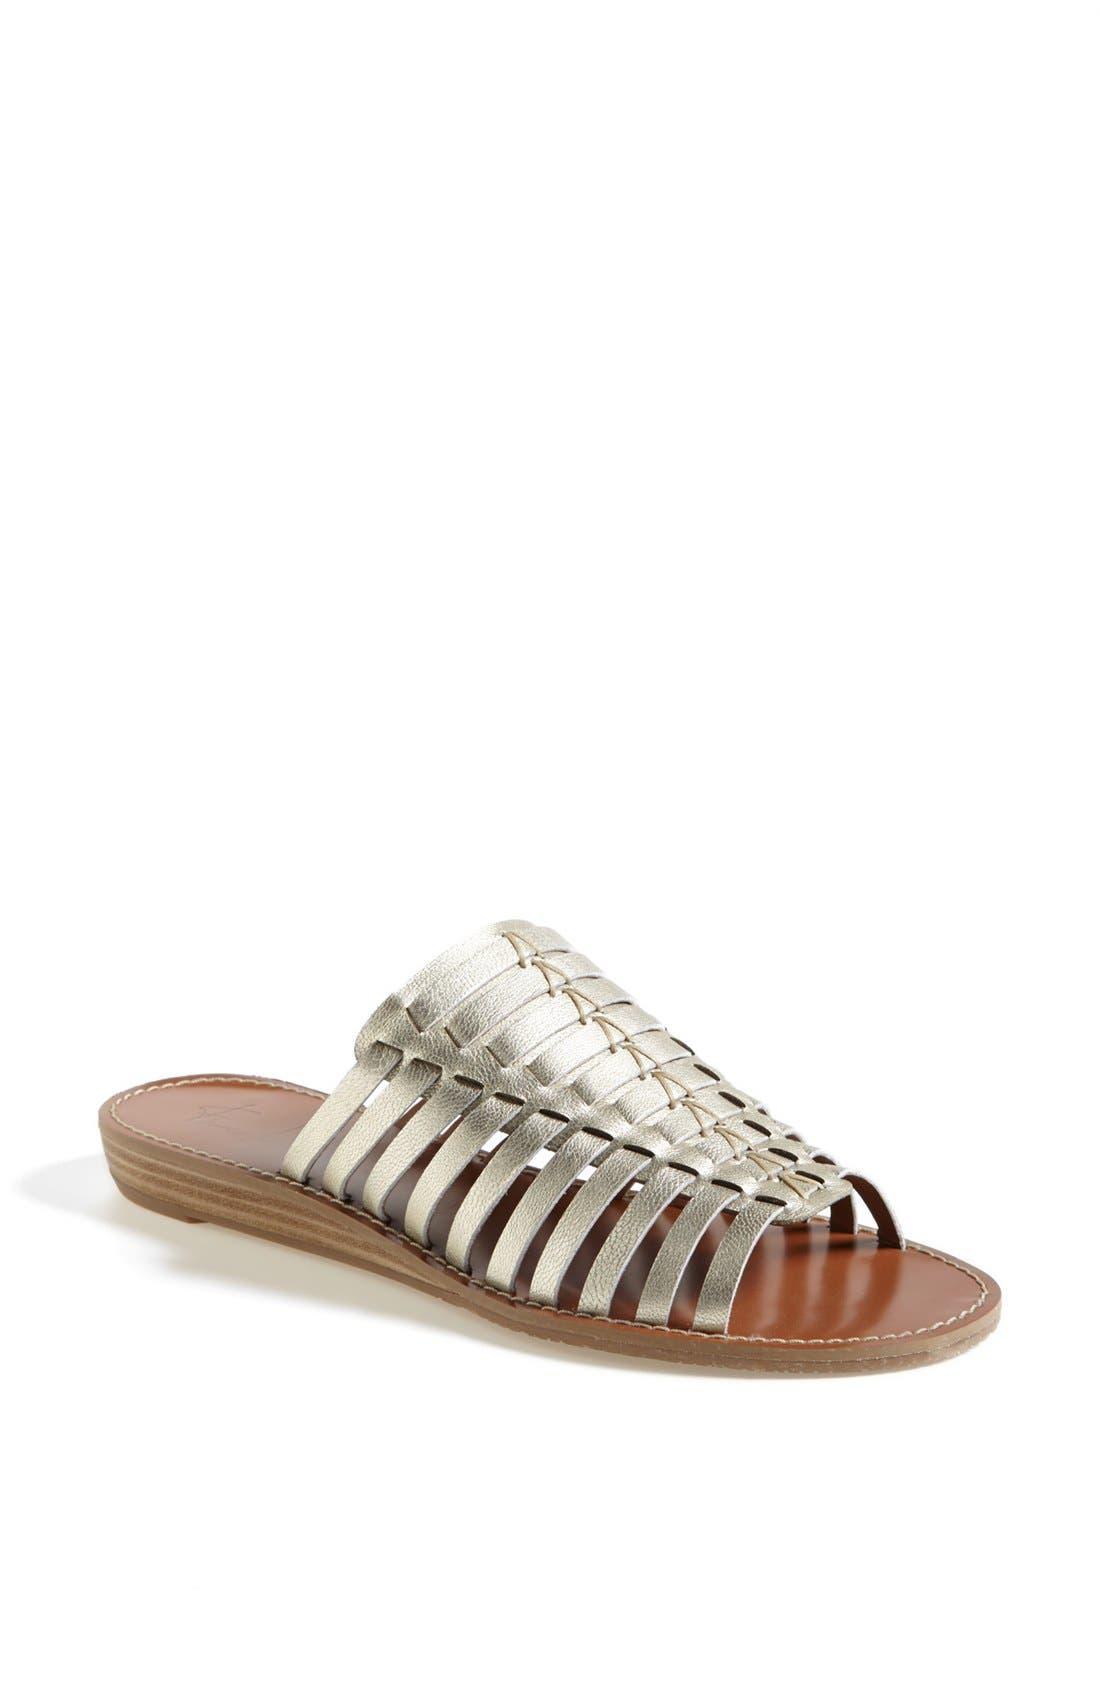 Main Image - Franco Sarto 'Duval' Sandal